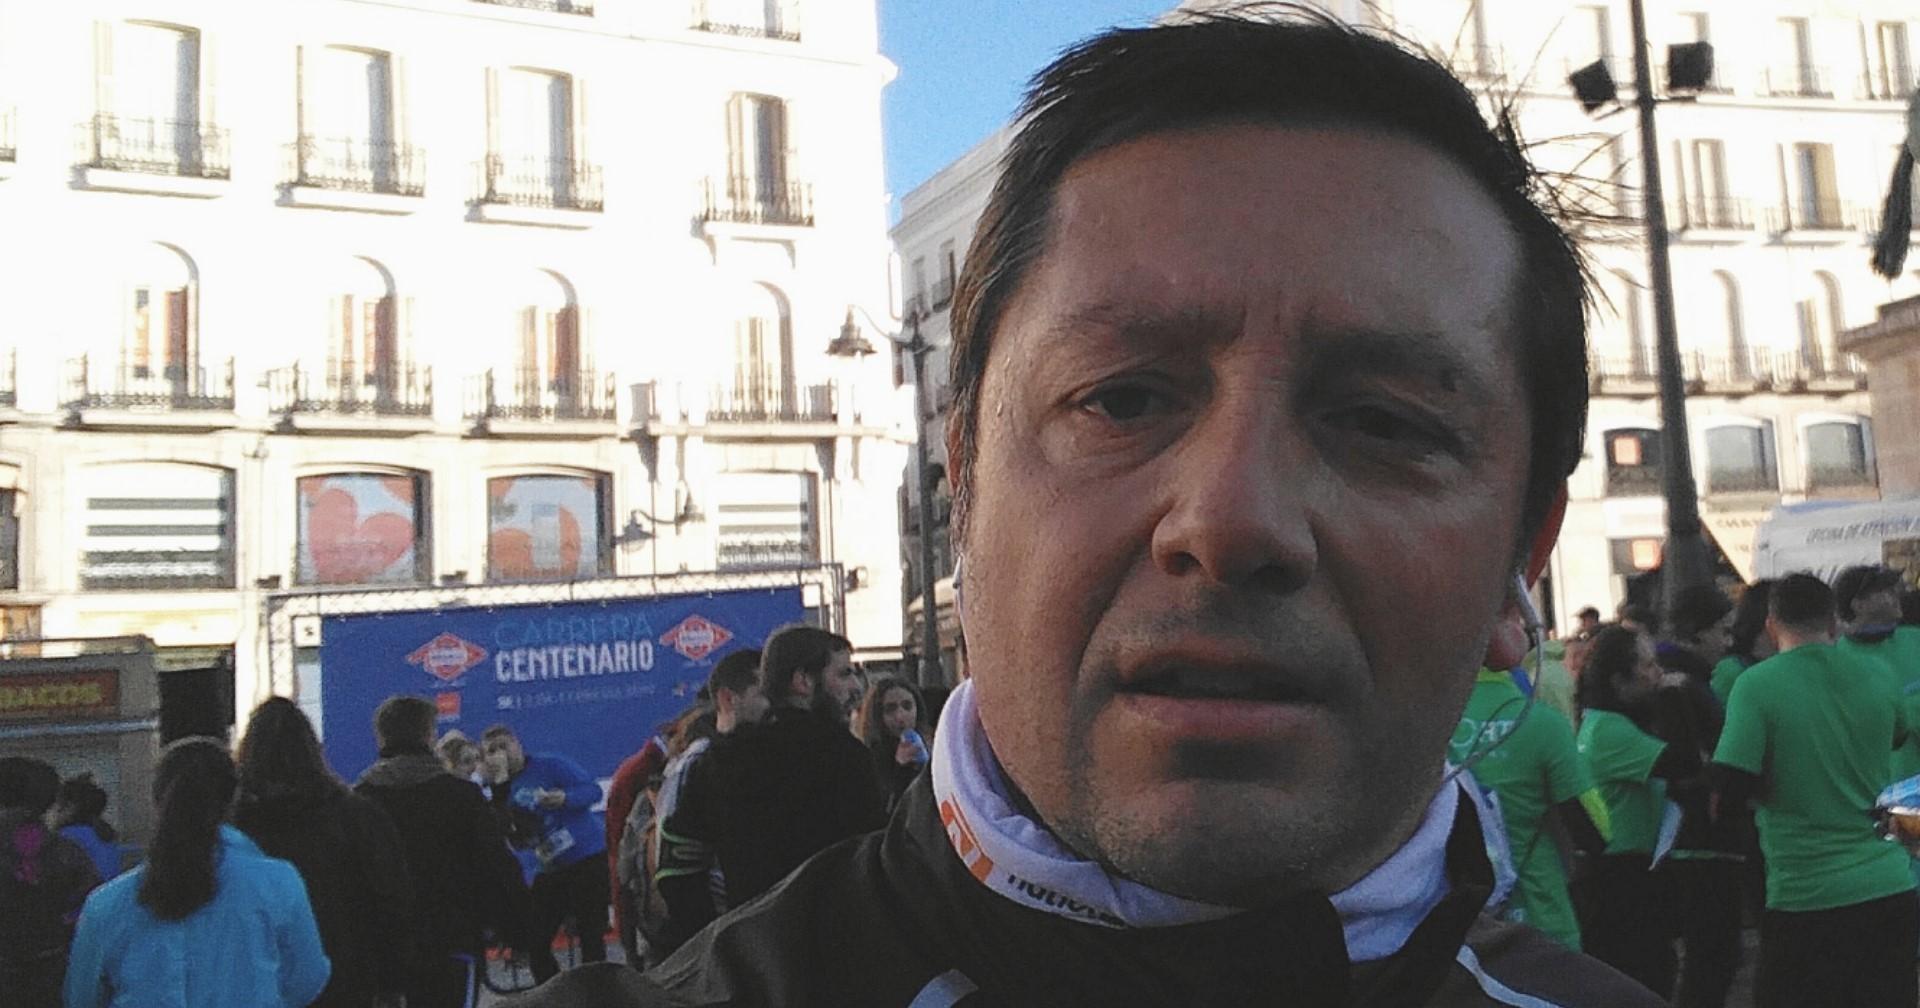 Milano Marathon 2019-Marco Midali